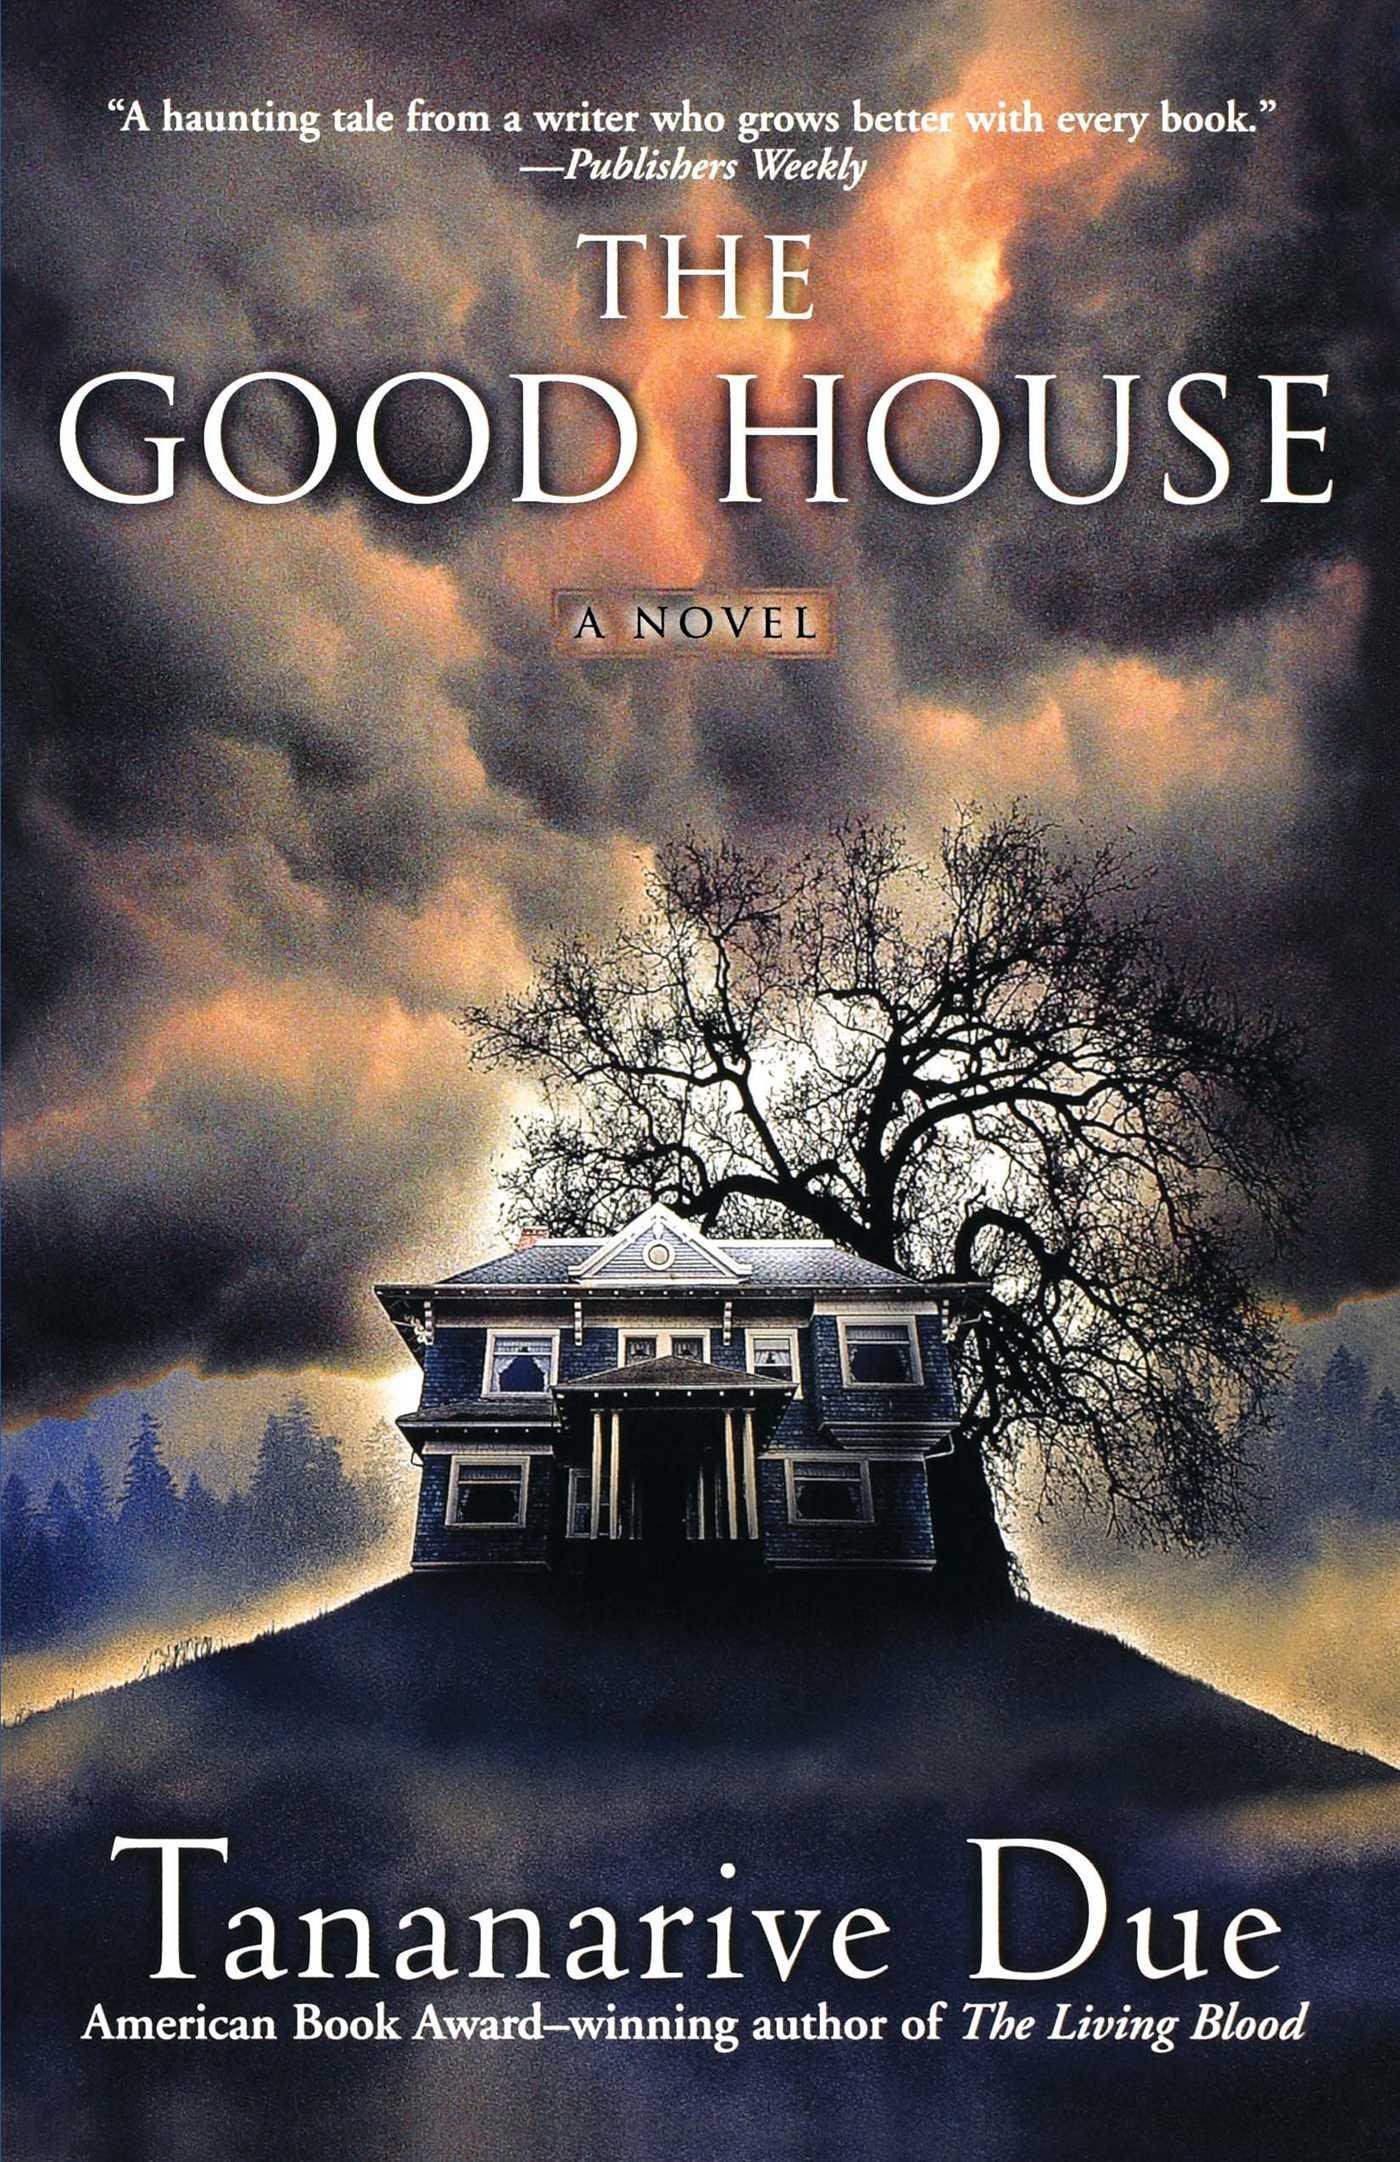 GoodHouse